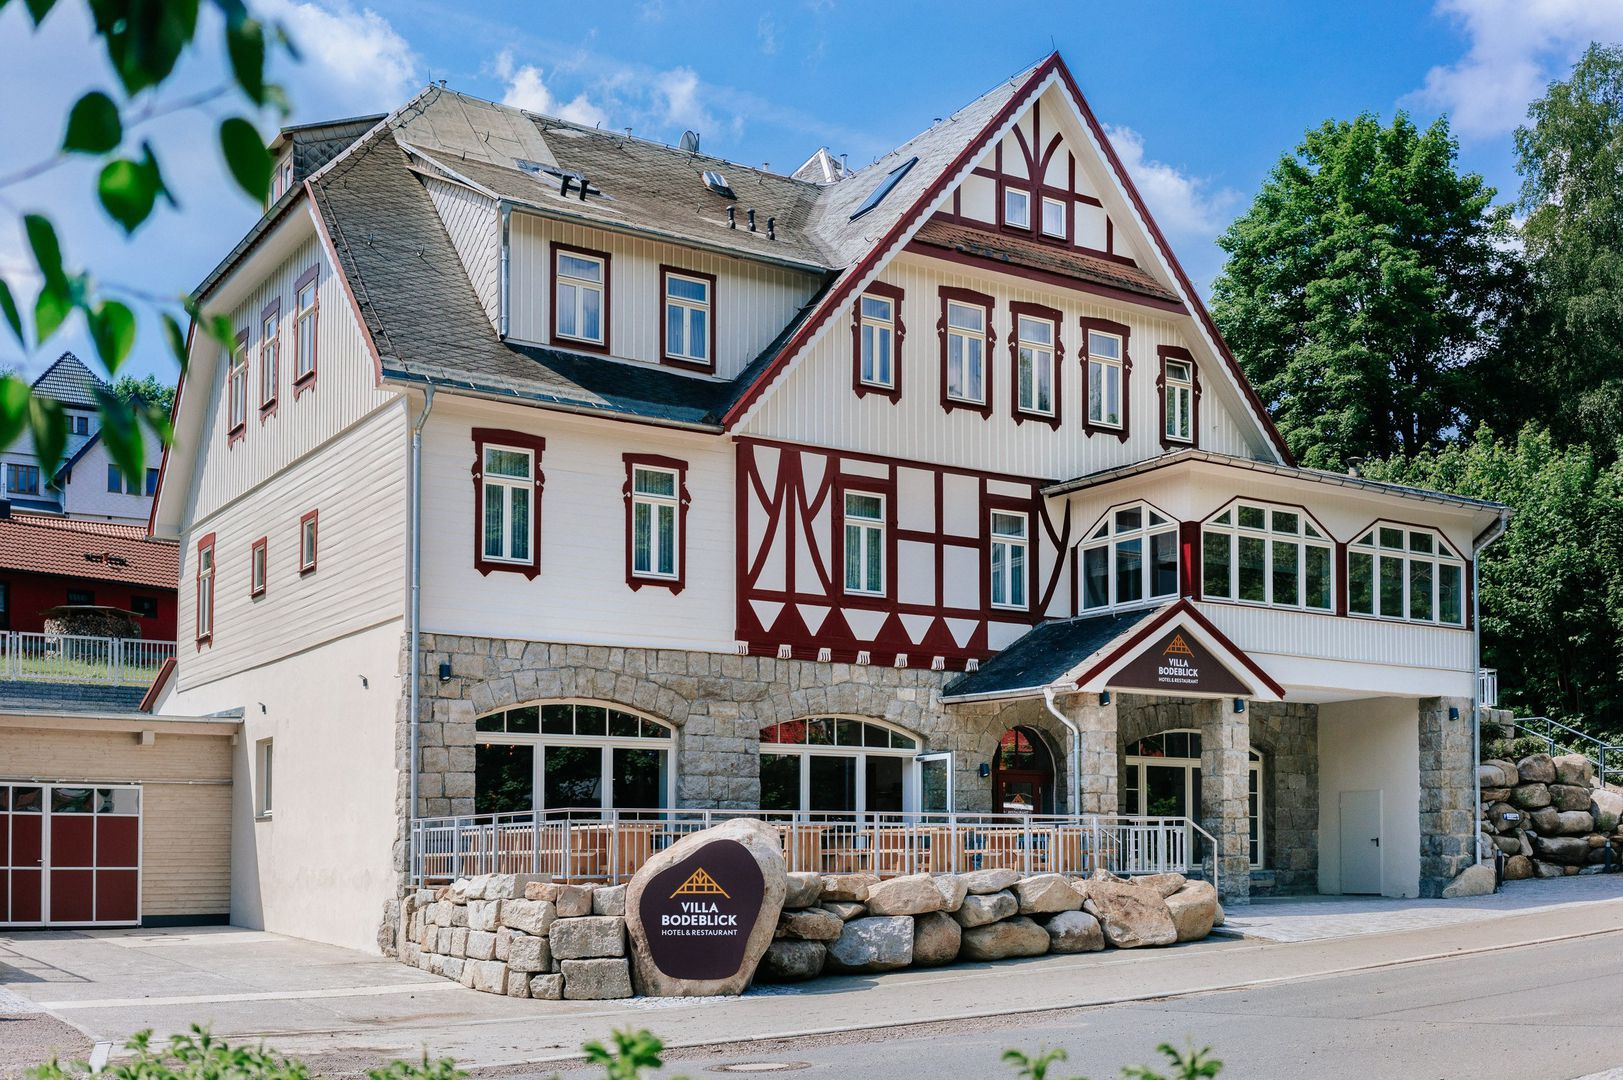 Hotel Villa Bodeblick